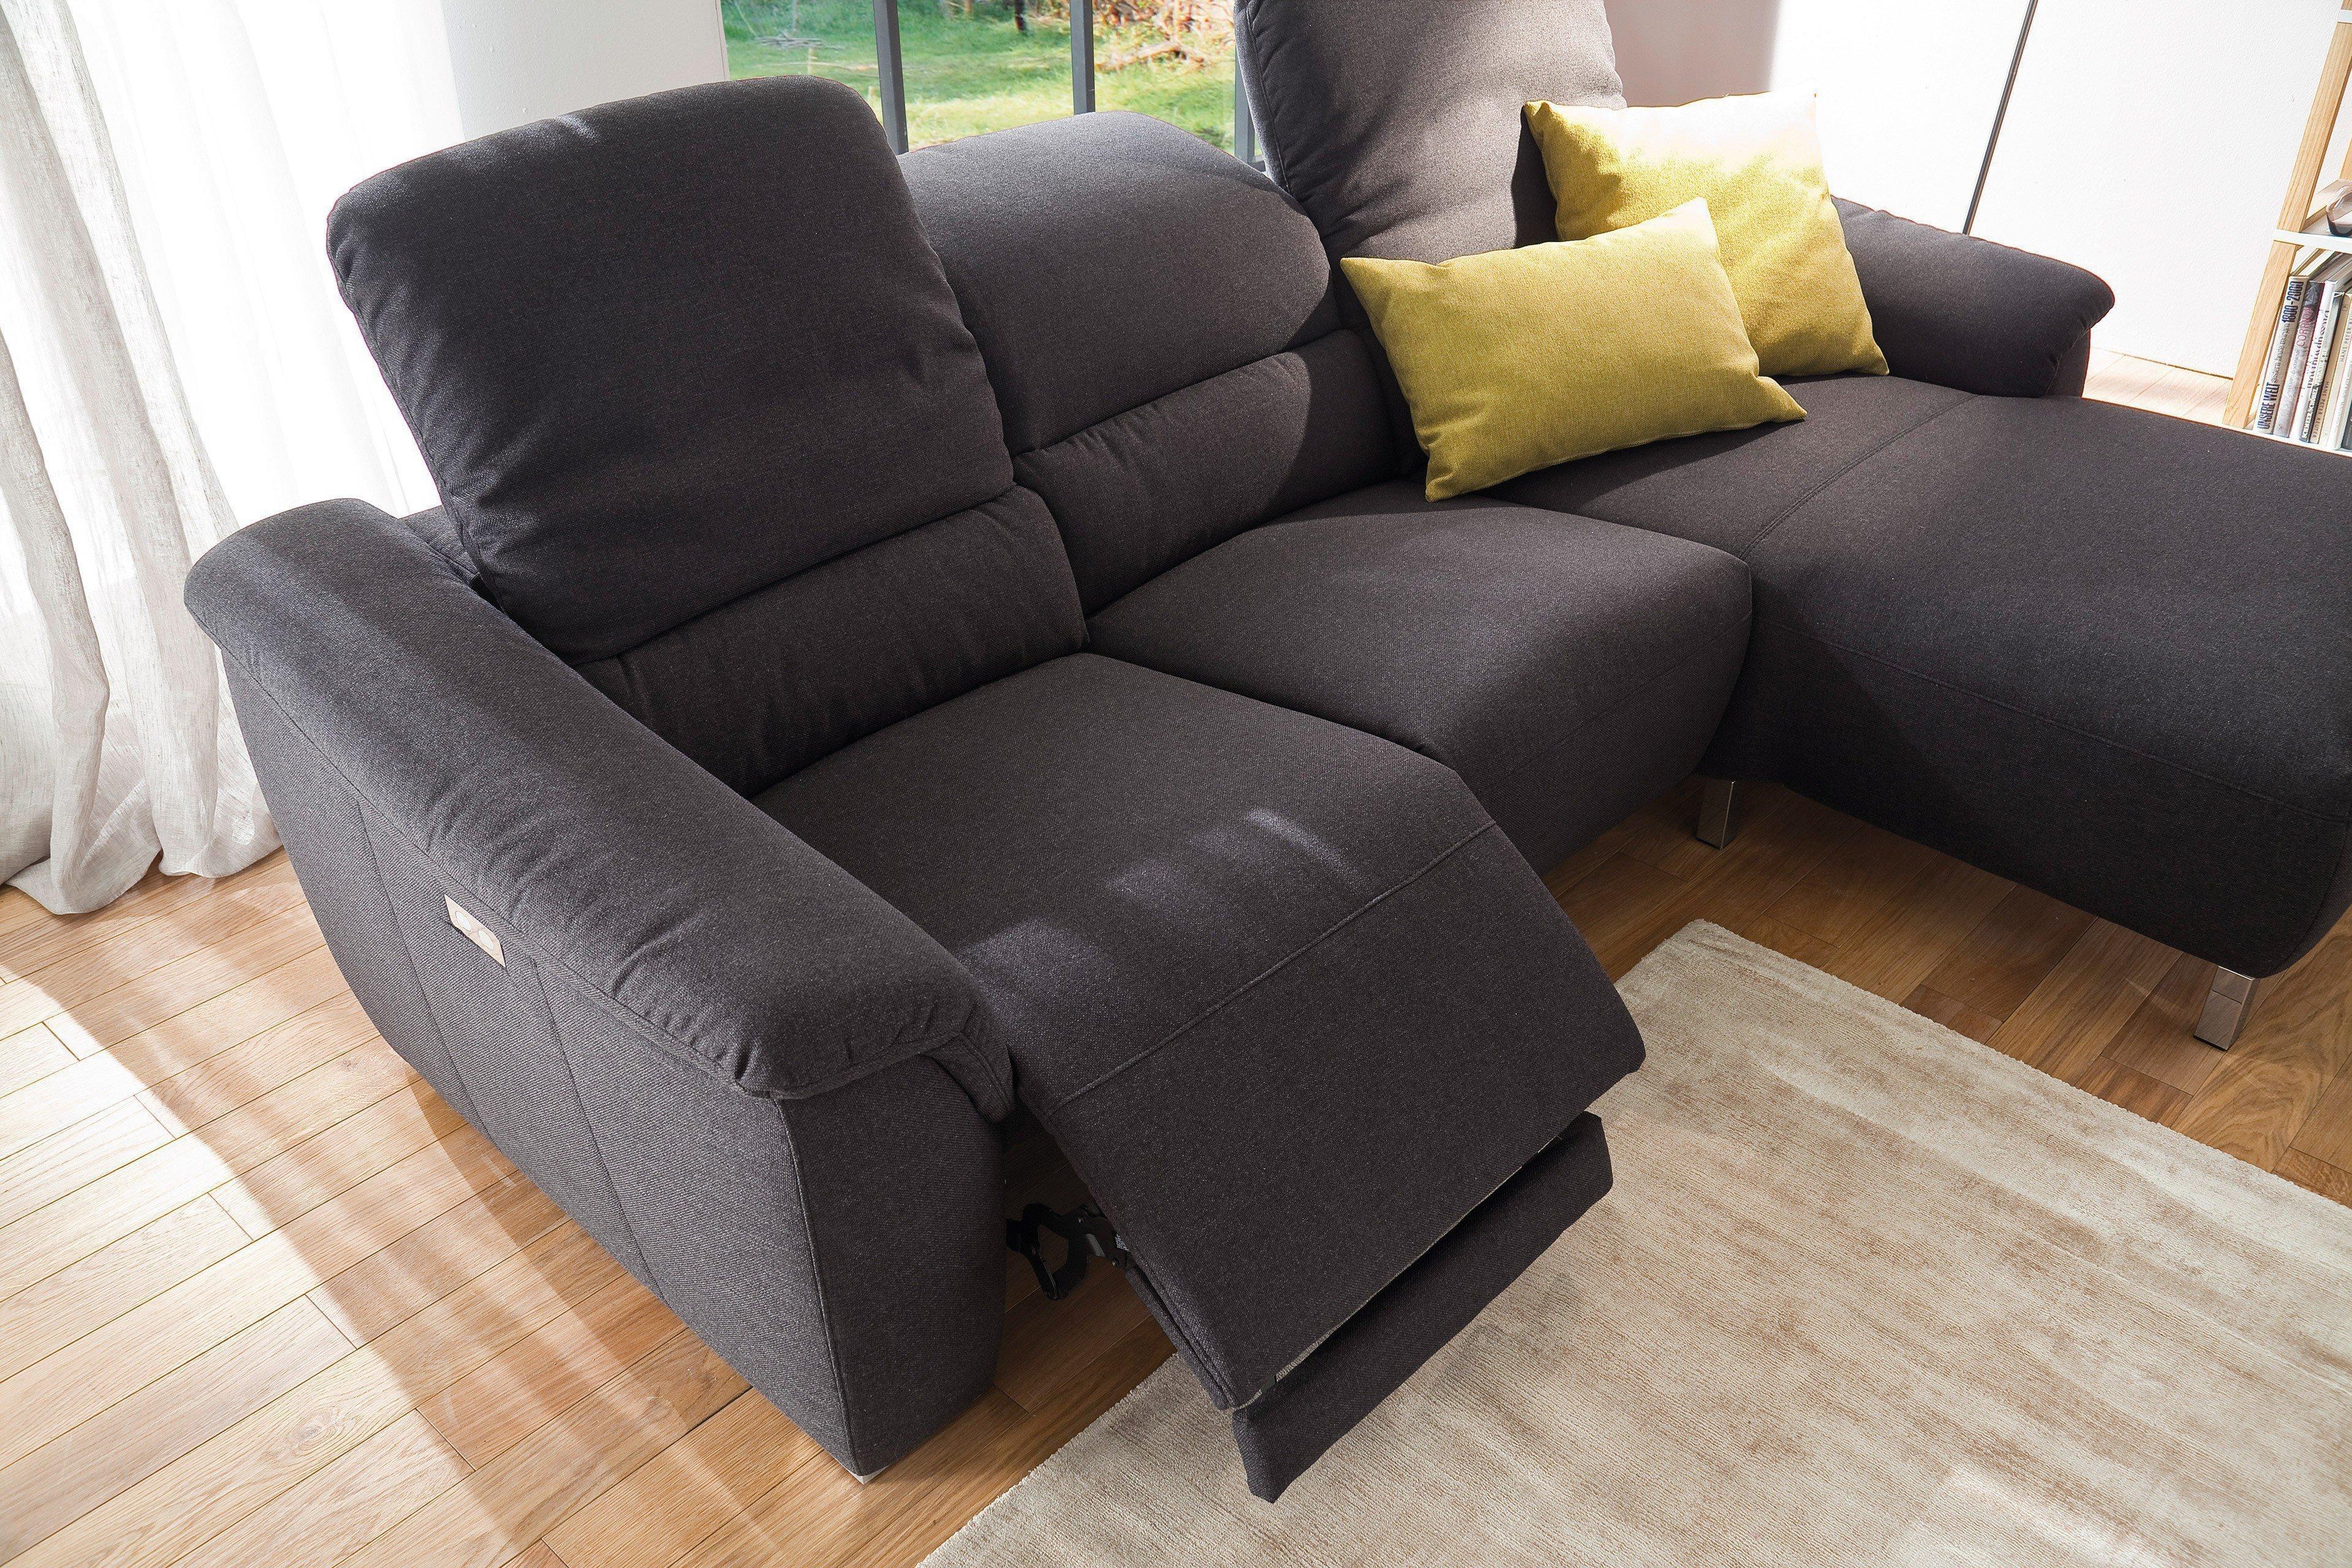 carina polsterm bel java ecksofa in dunkelgrau m bel letz ihr online shop. Black Bedroom Furniture Sets. Home Design Ideas